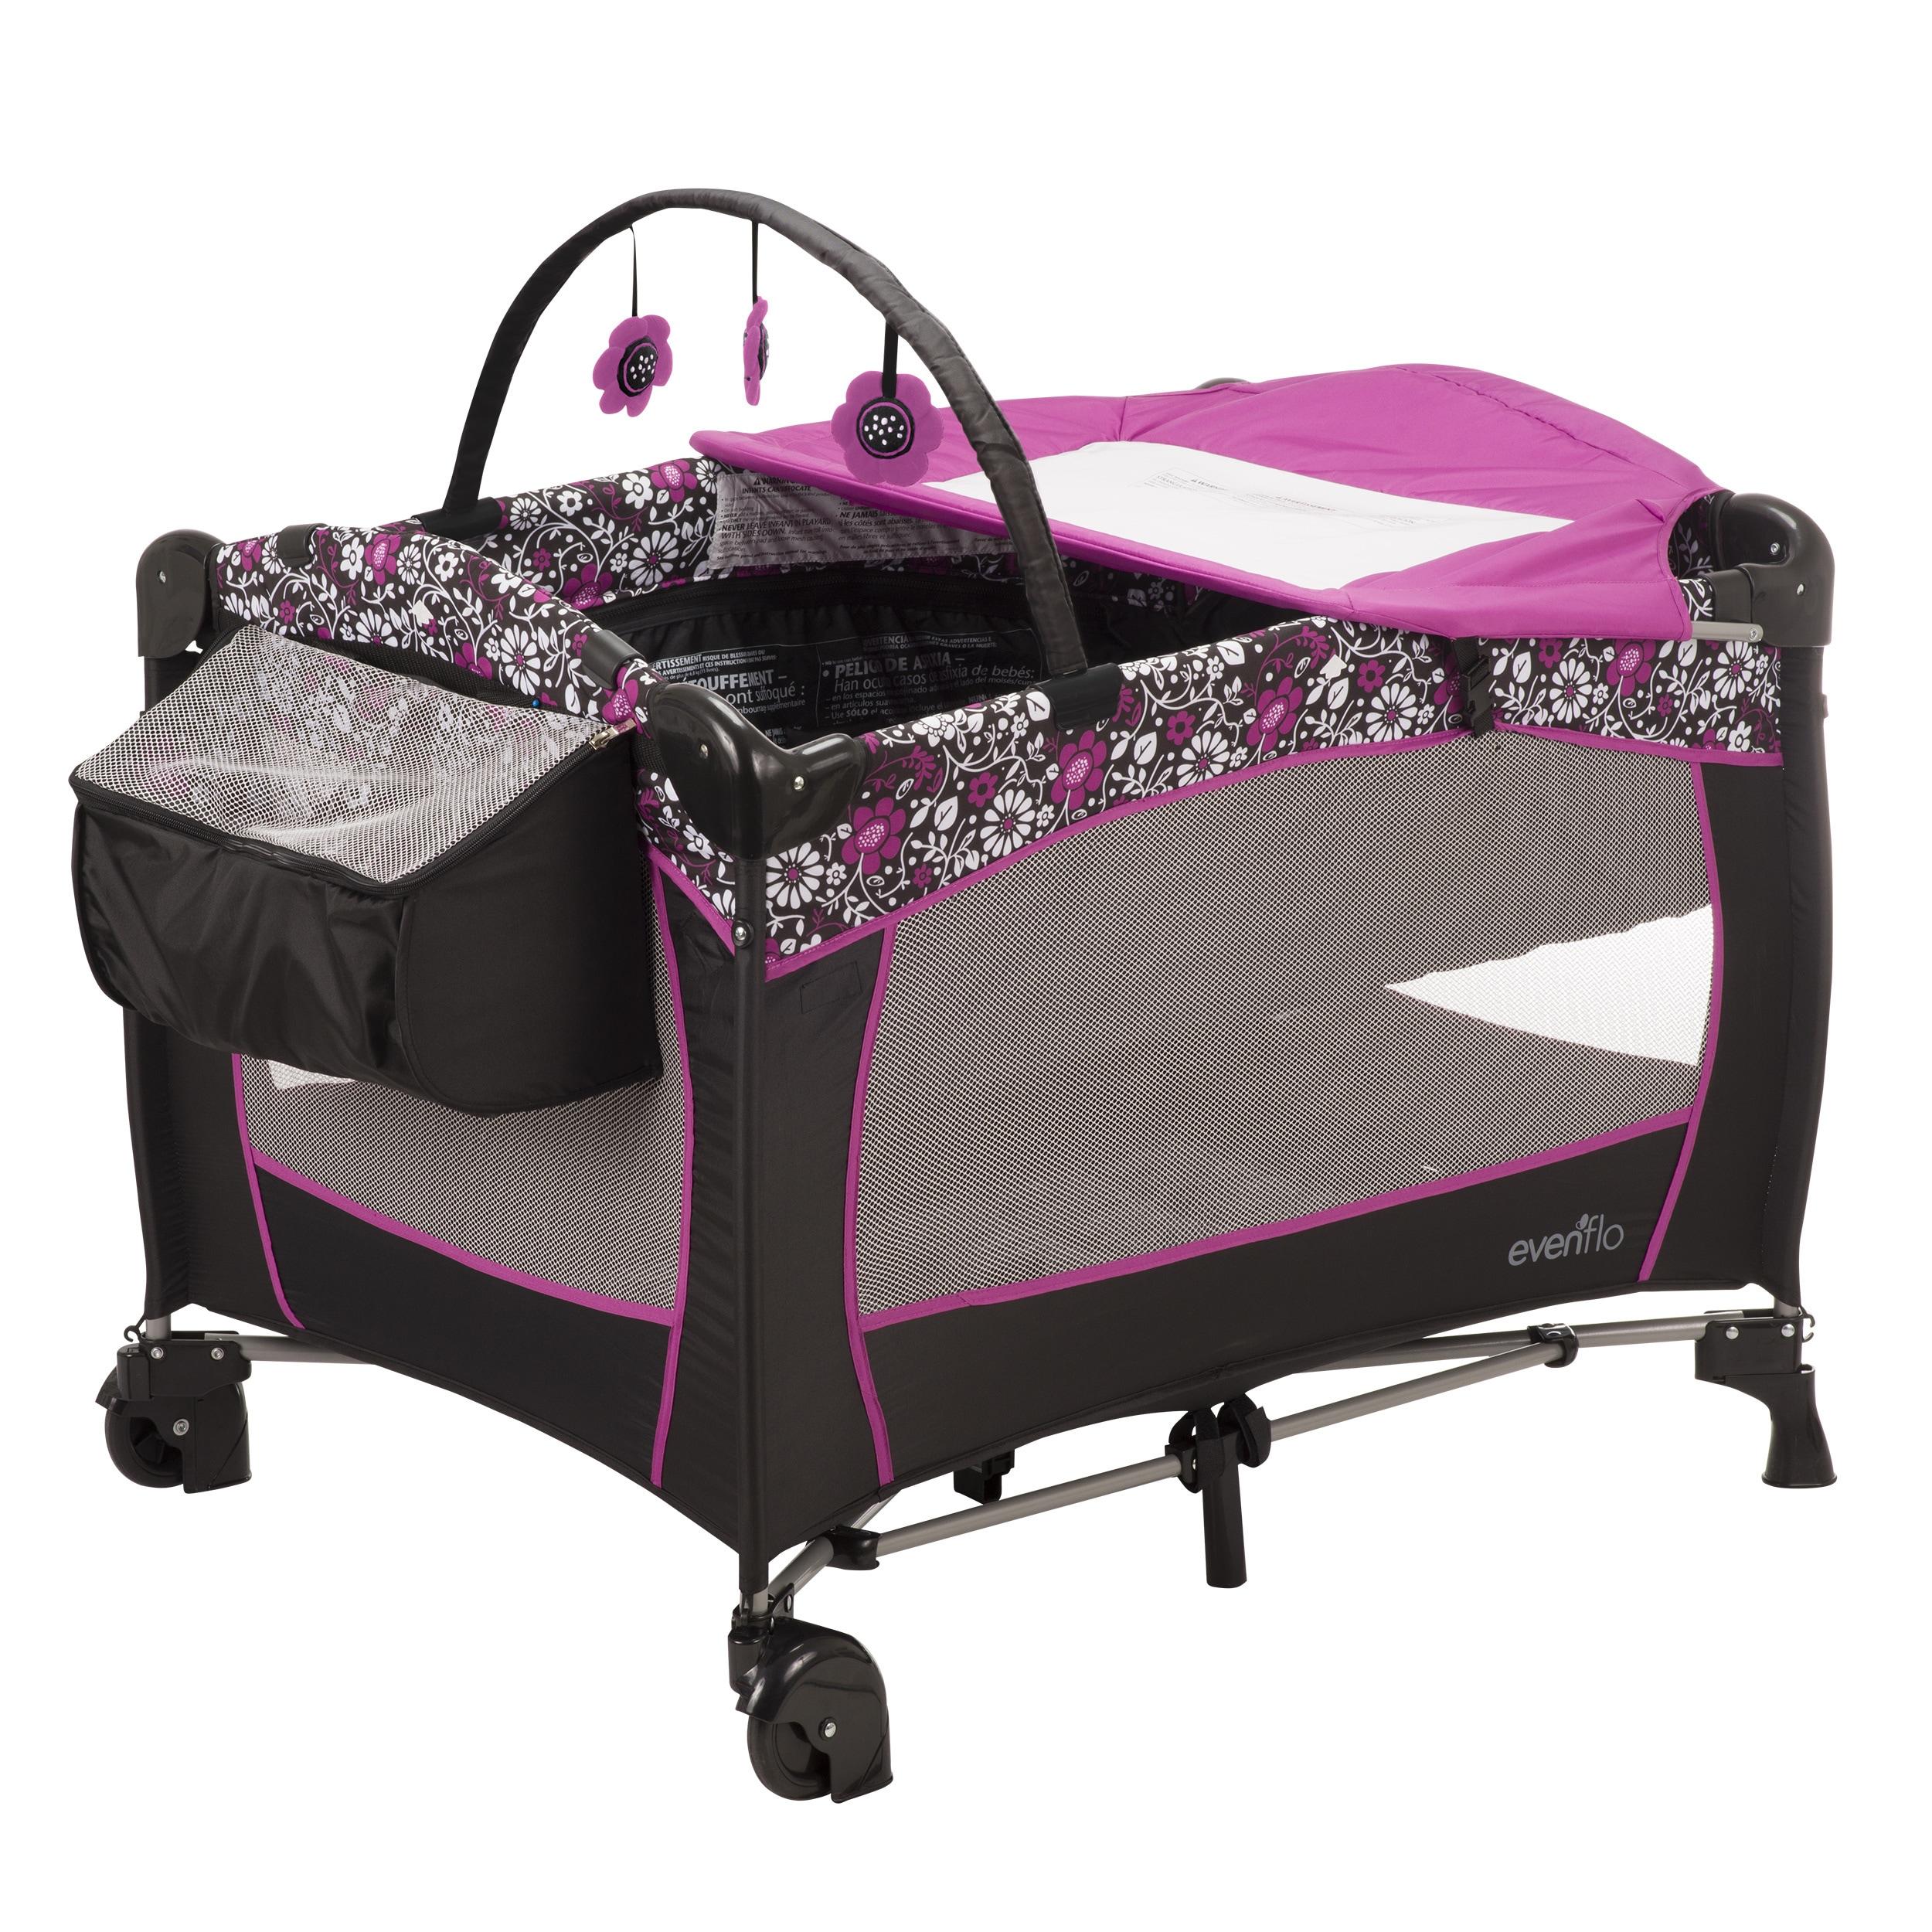 Evenflo Portable BabySuite Deluxe in Daphne (Daphne), Pink